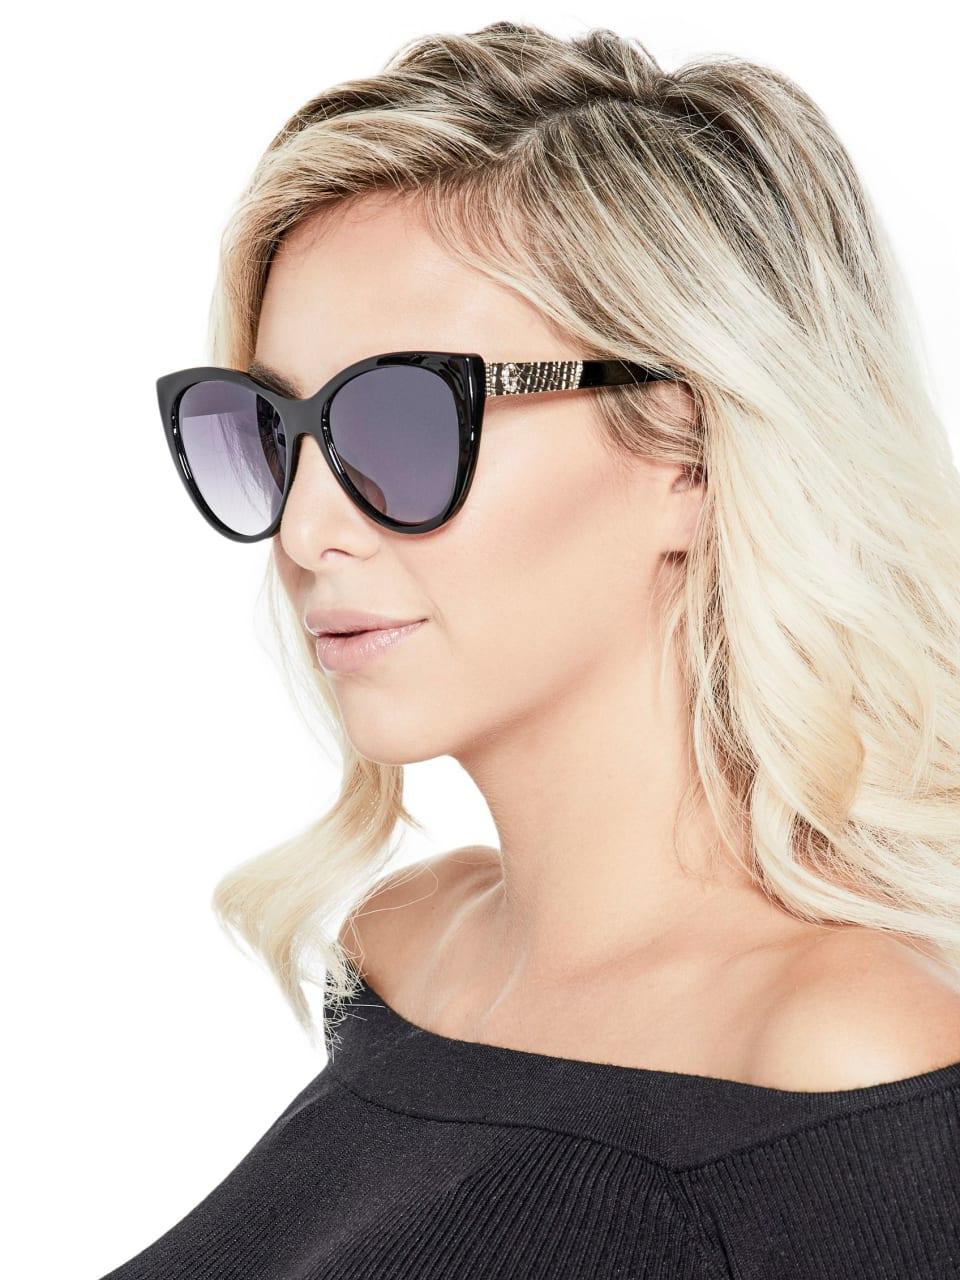 GUESS-Factory-Women-039-s-Plastic-Cat-Eye-Sunglasses thumbnail 5